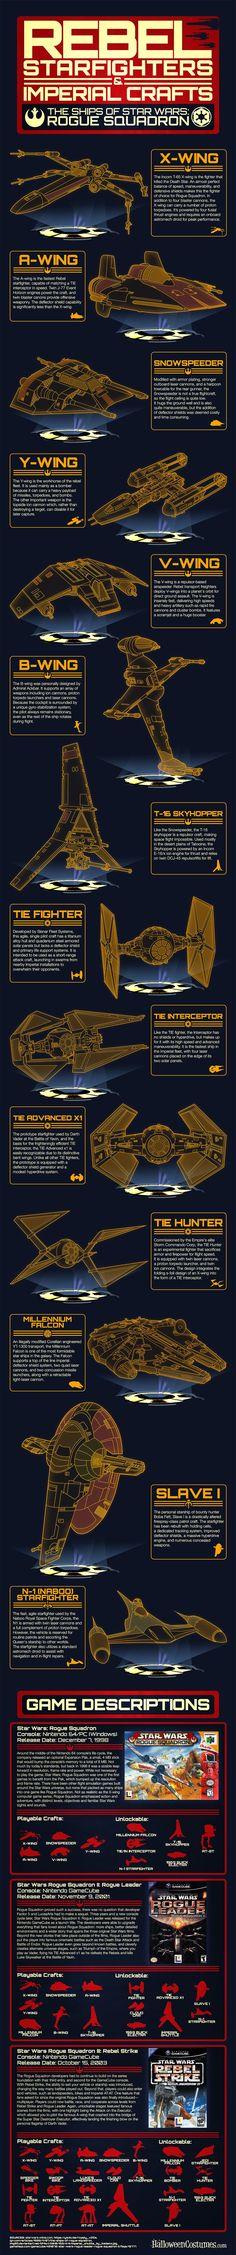 Star Wars: Rebel Starfighters & Imperial Crafts